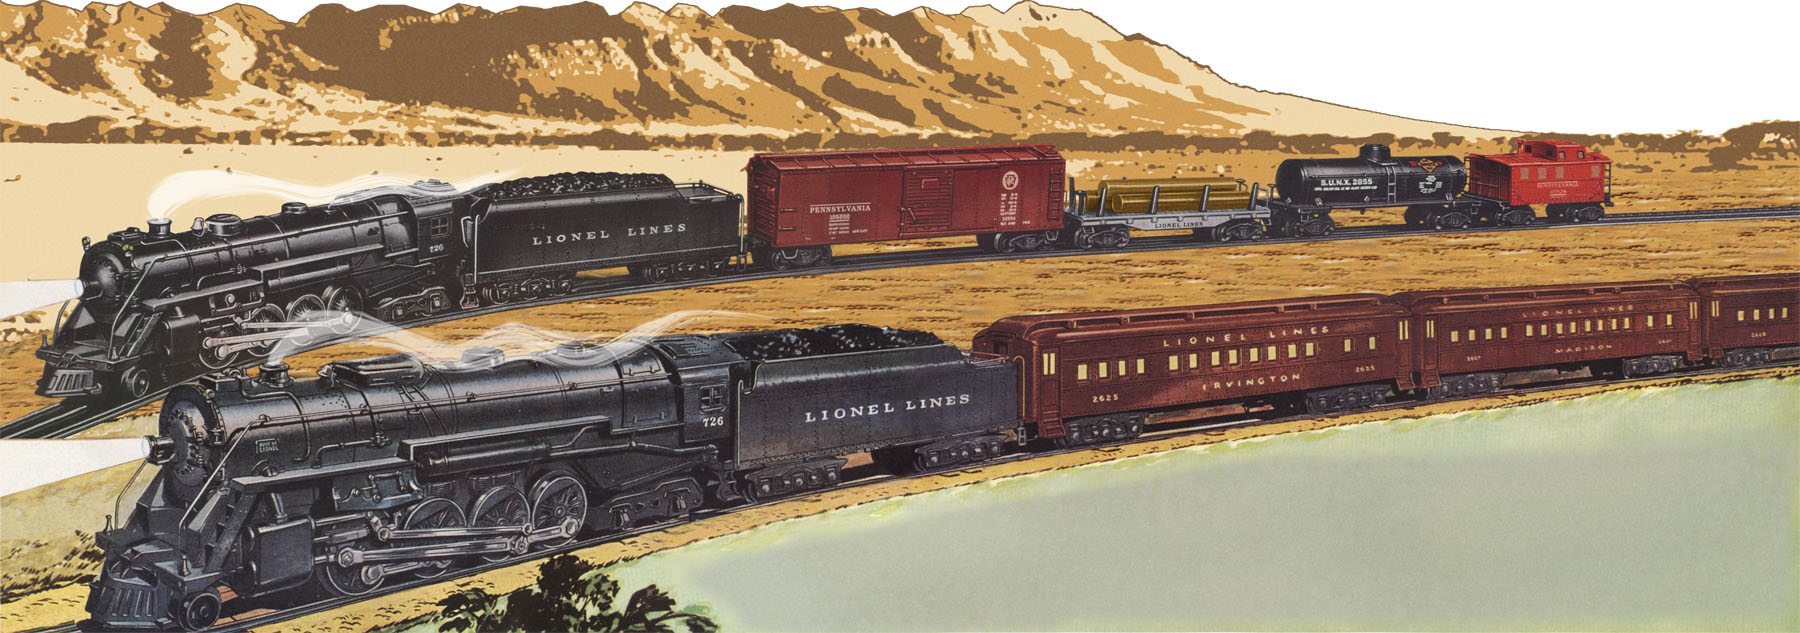 2 LIONEL PART- 726-109 ORIGINAL- NEW-H30 BERKSHIRE 726//736 HANDRAILS